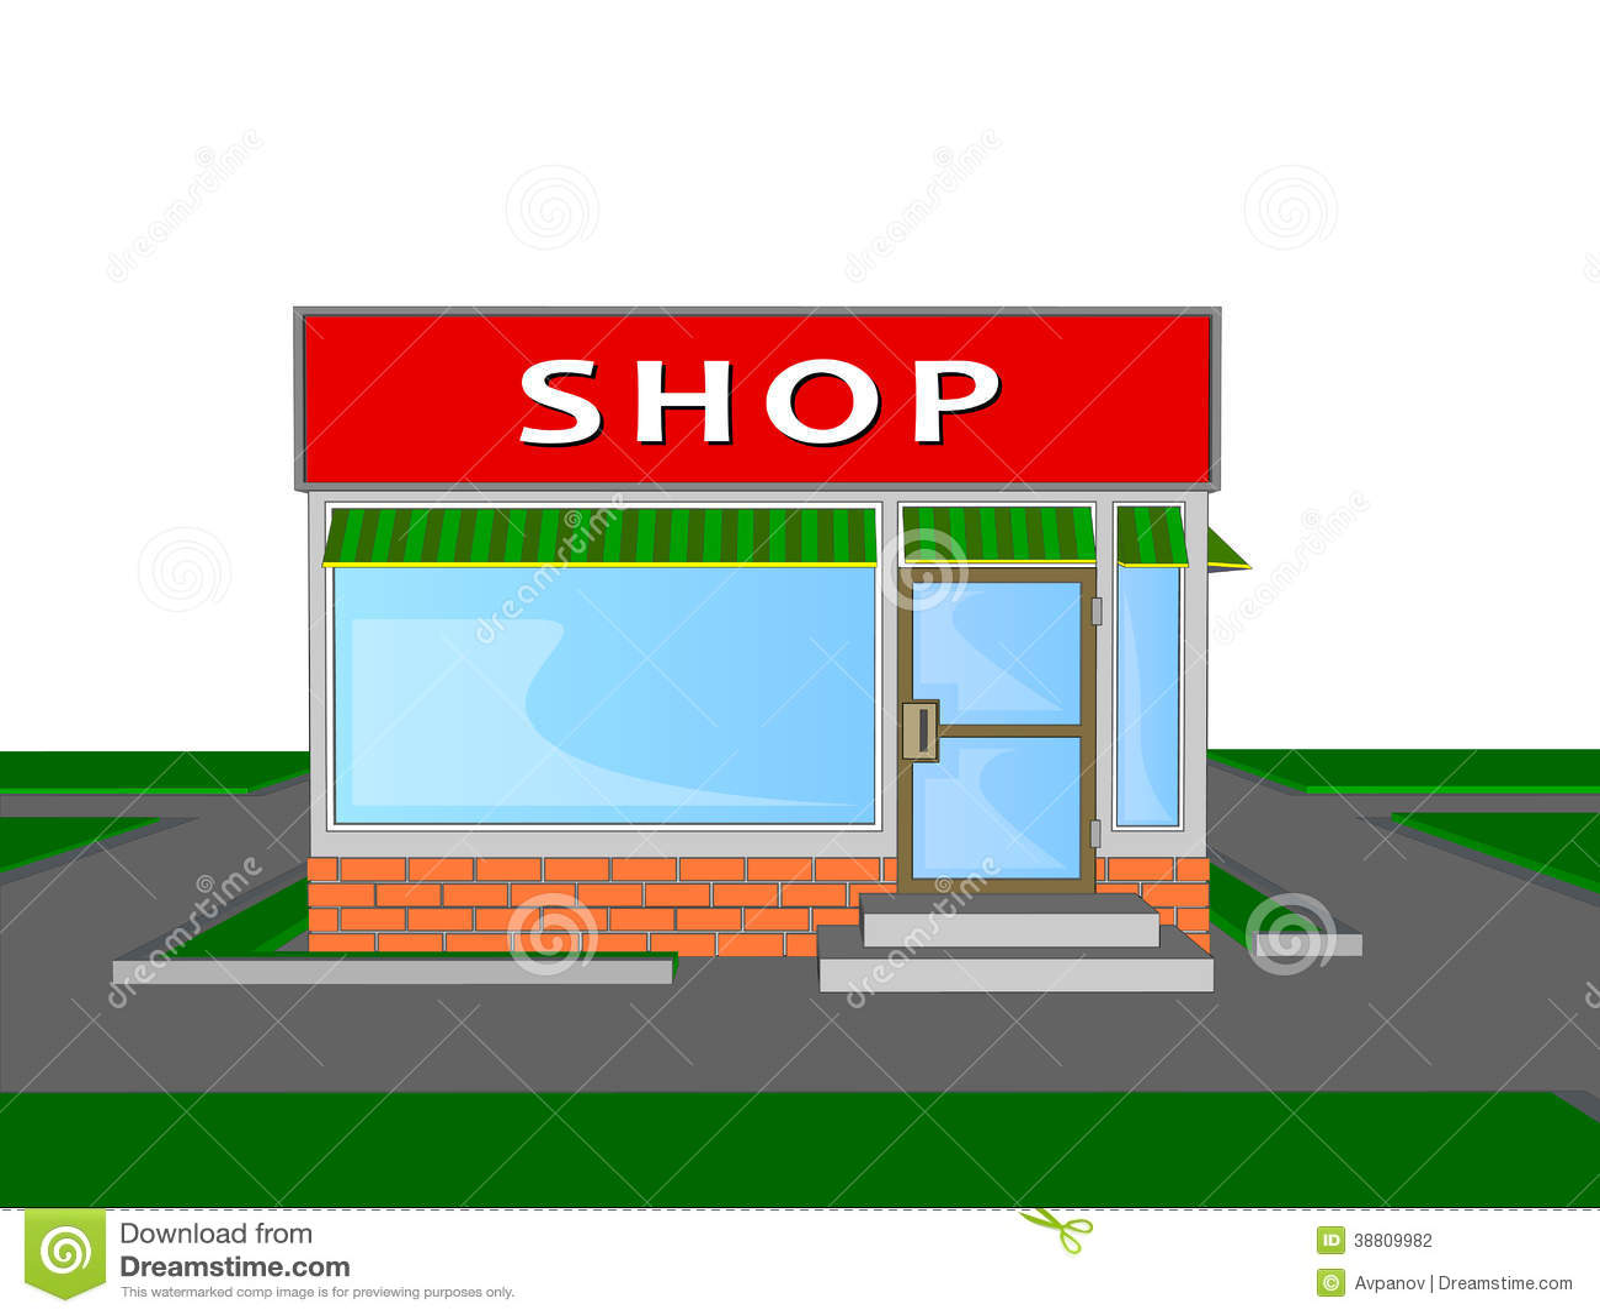 Mini Market Shop Store Retail Shopping Face Stock Vector